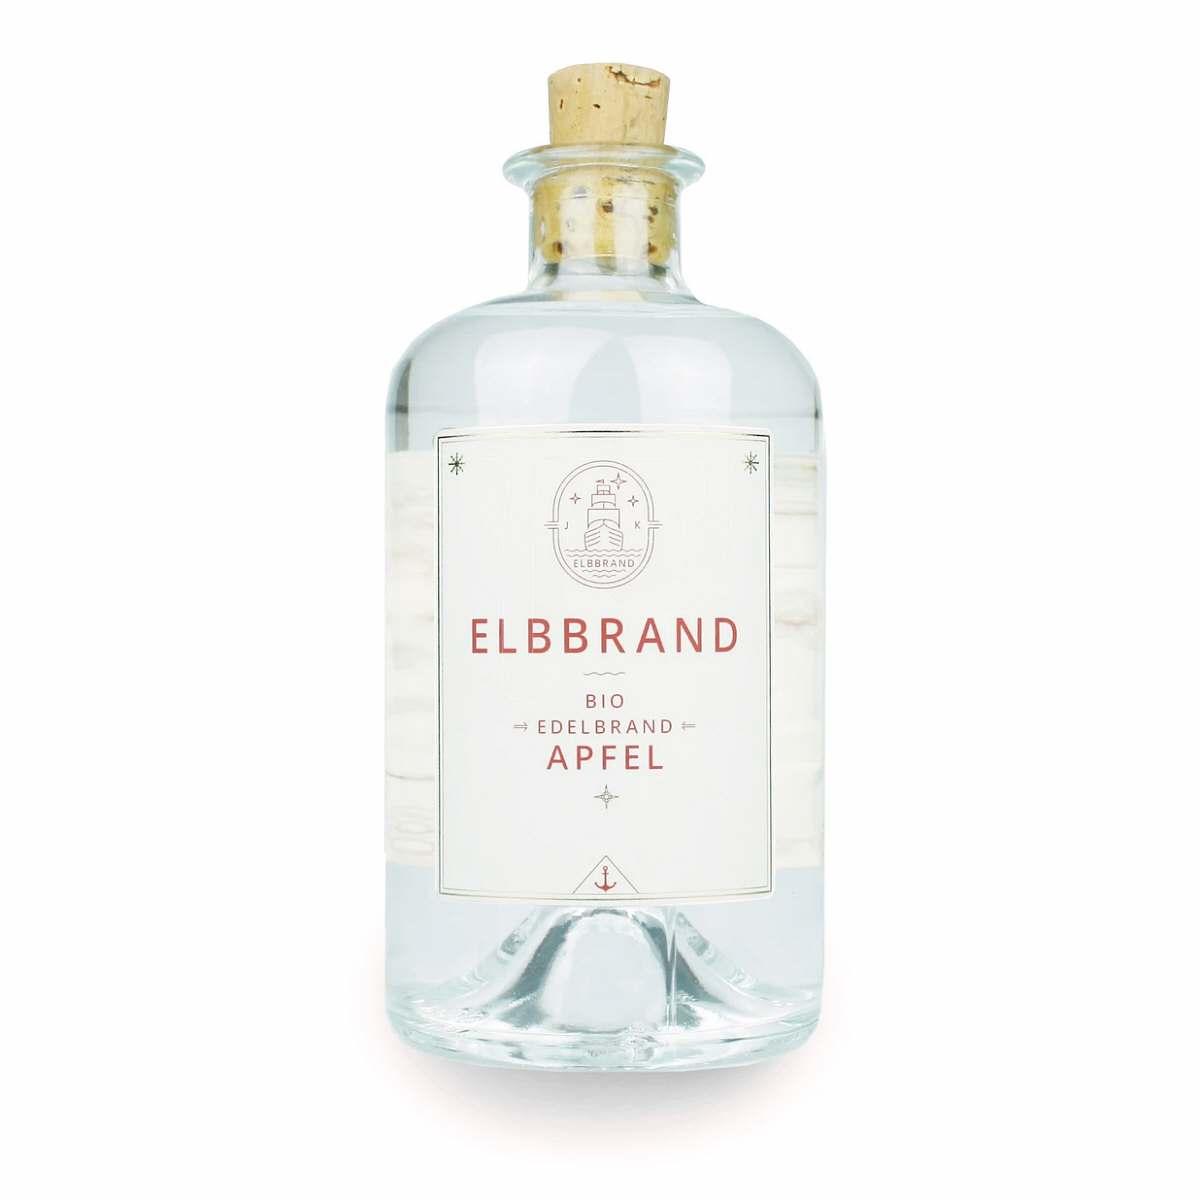 Bio Elbbrand Apfelbrand